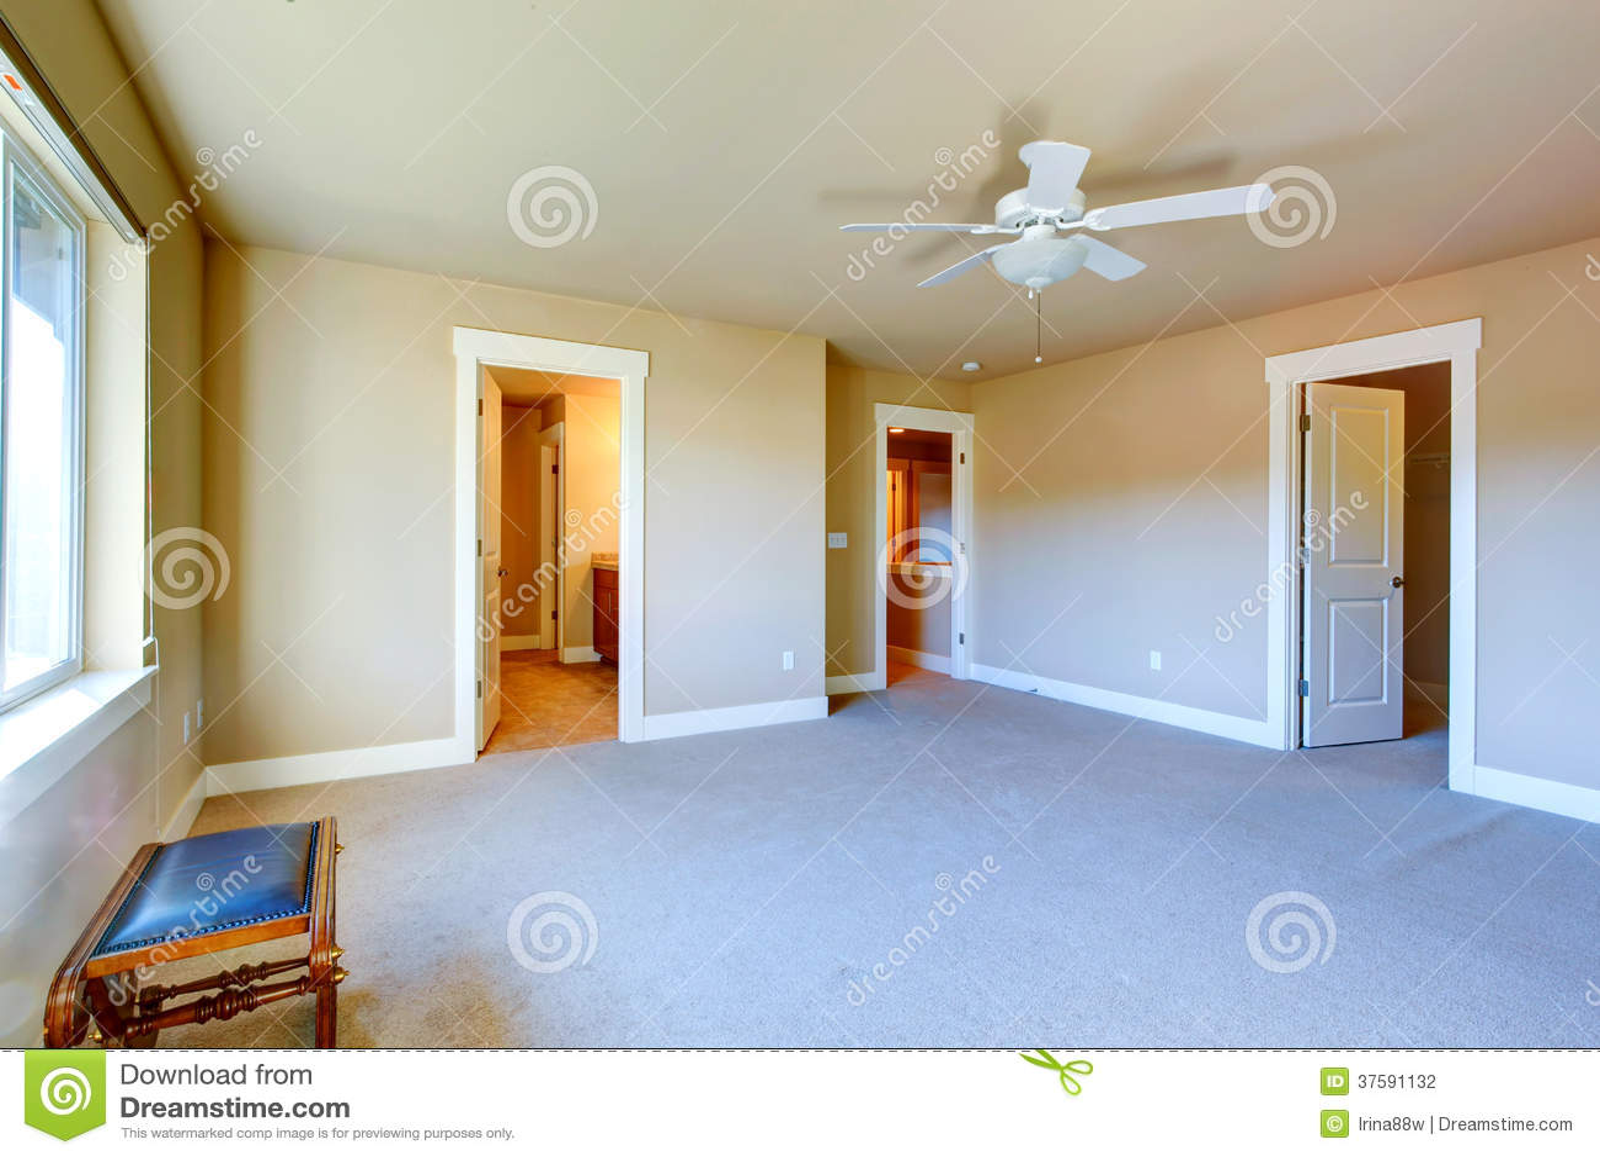 Chambre coucher principale vide avec la penderie et la for Chambre vide